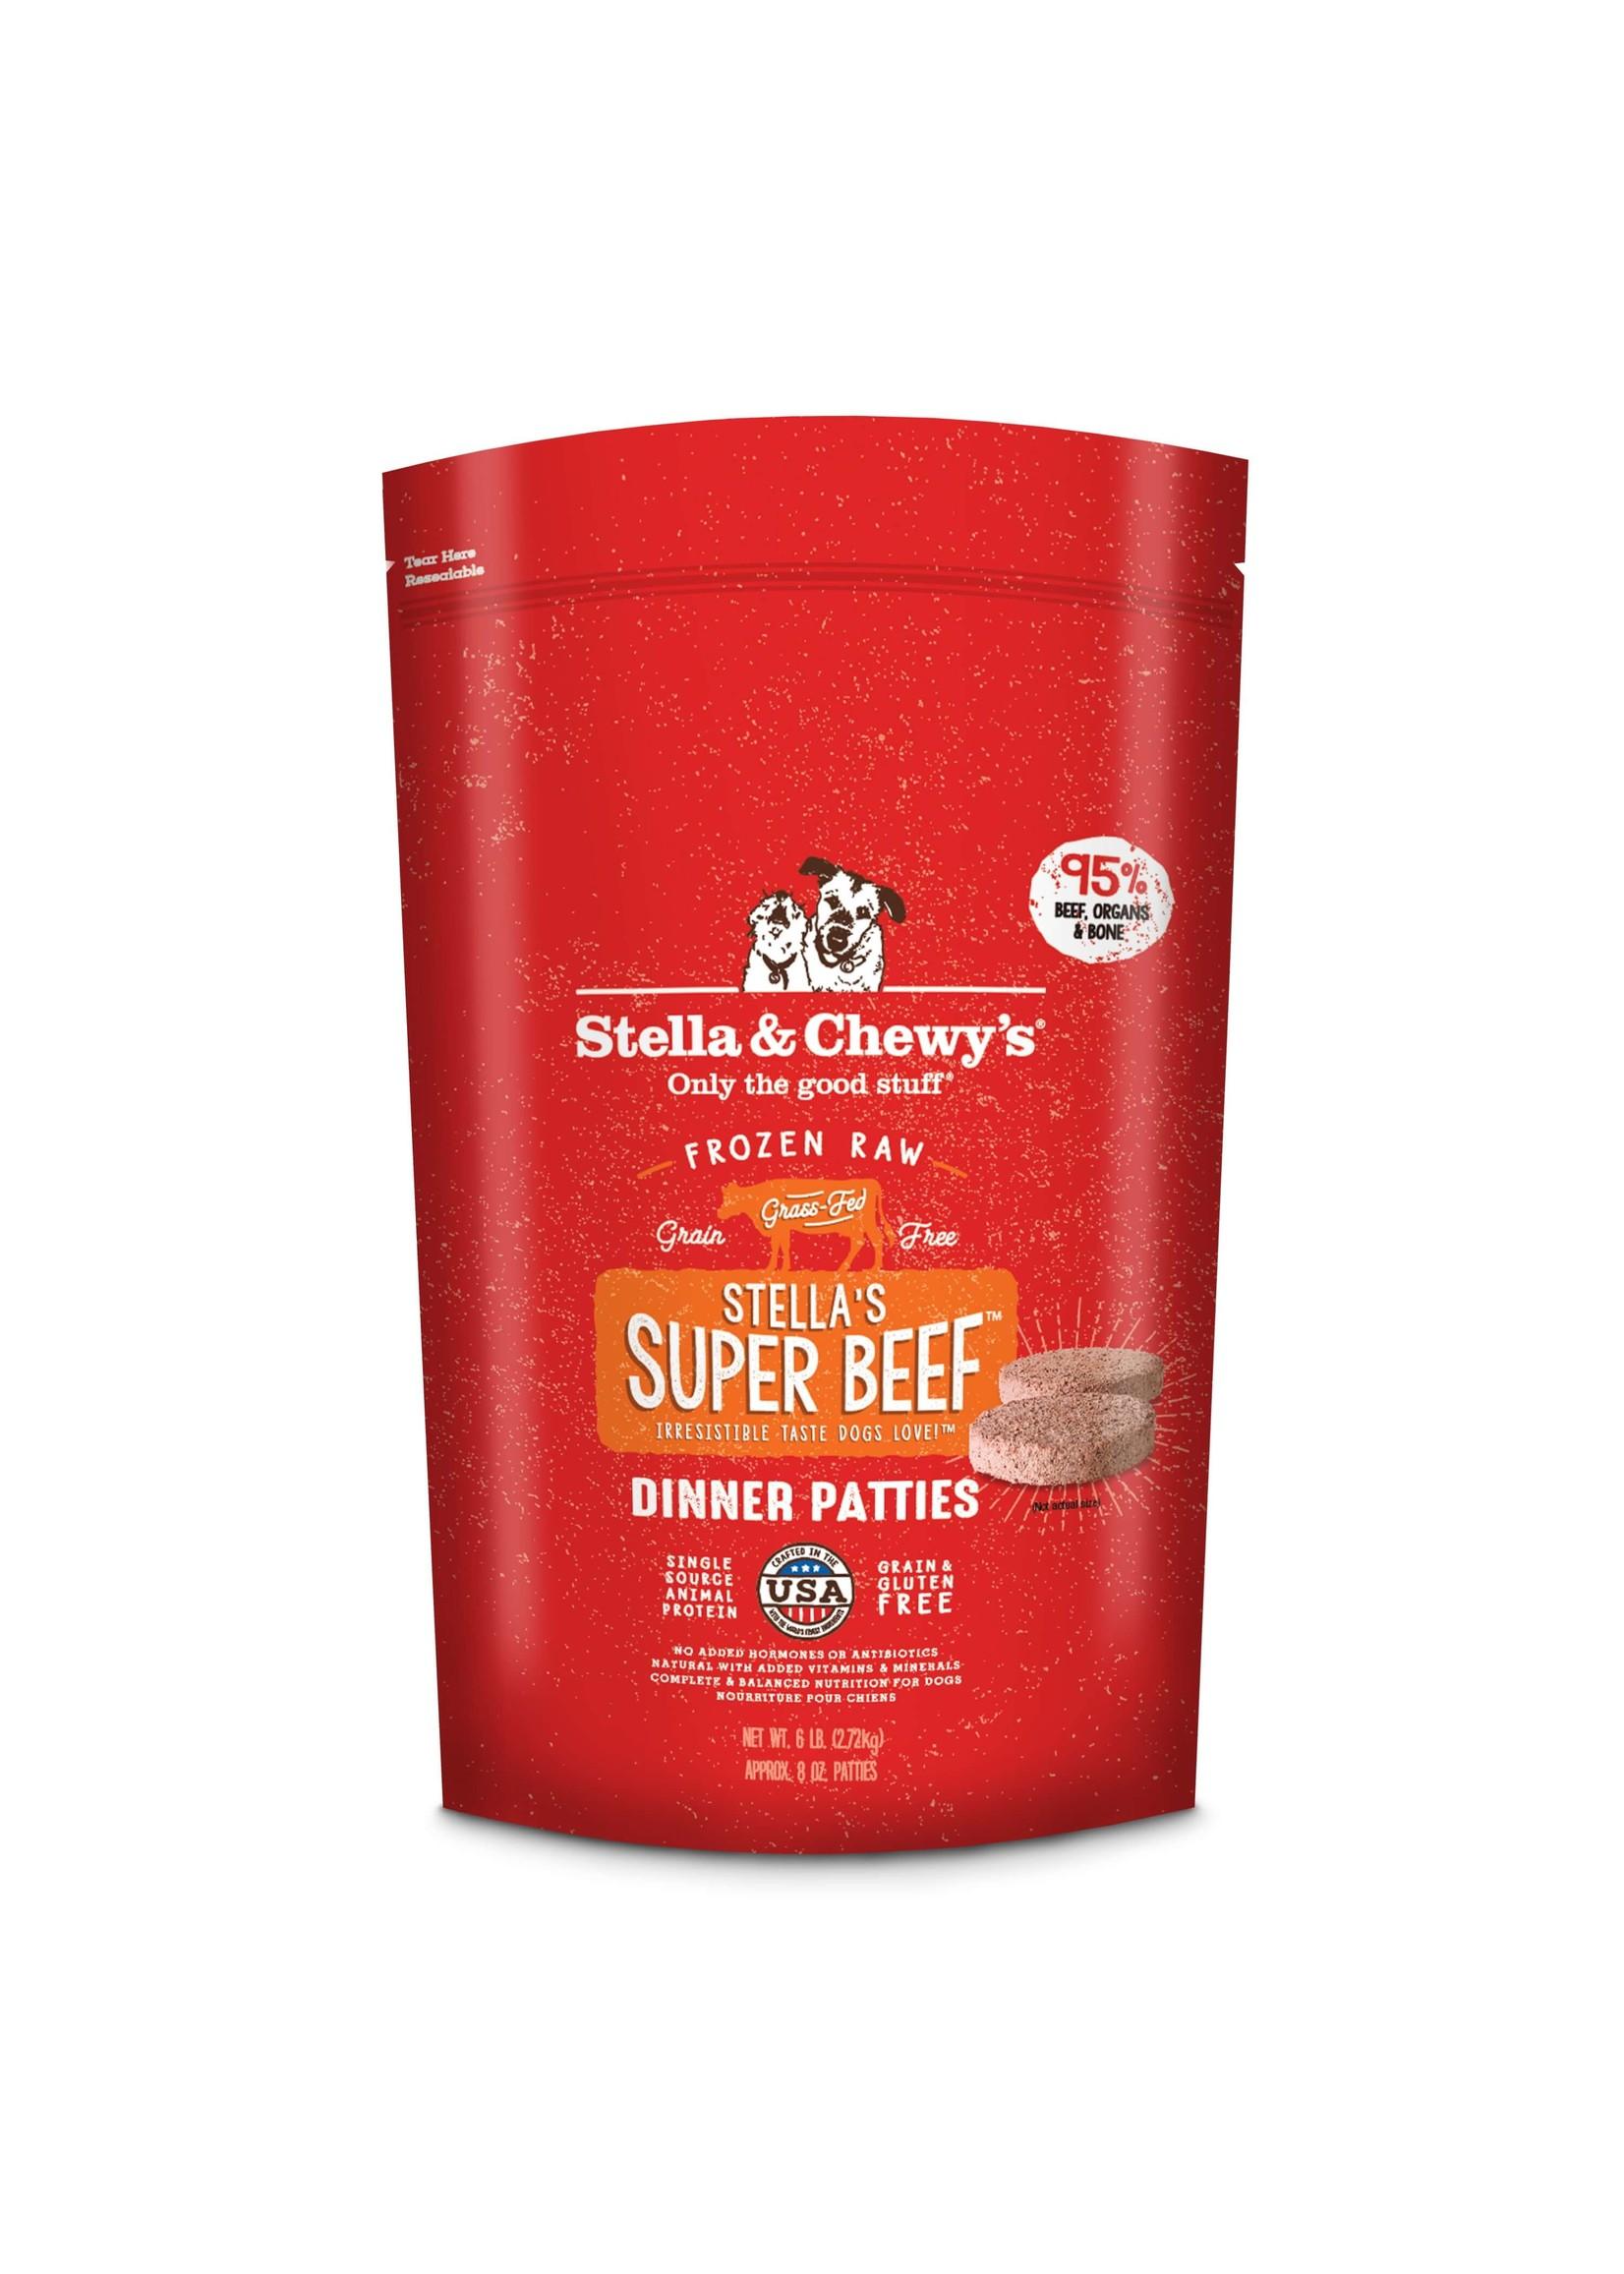 Stella & Chewy's Stella & Chewy's 6lb Super Beef Frozen Dinner Patties